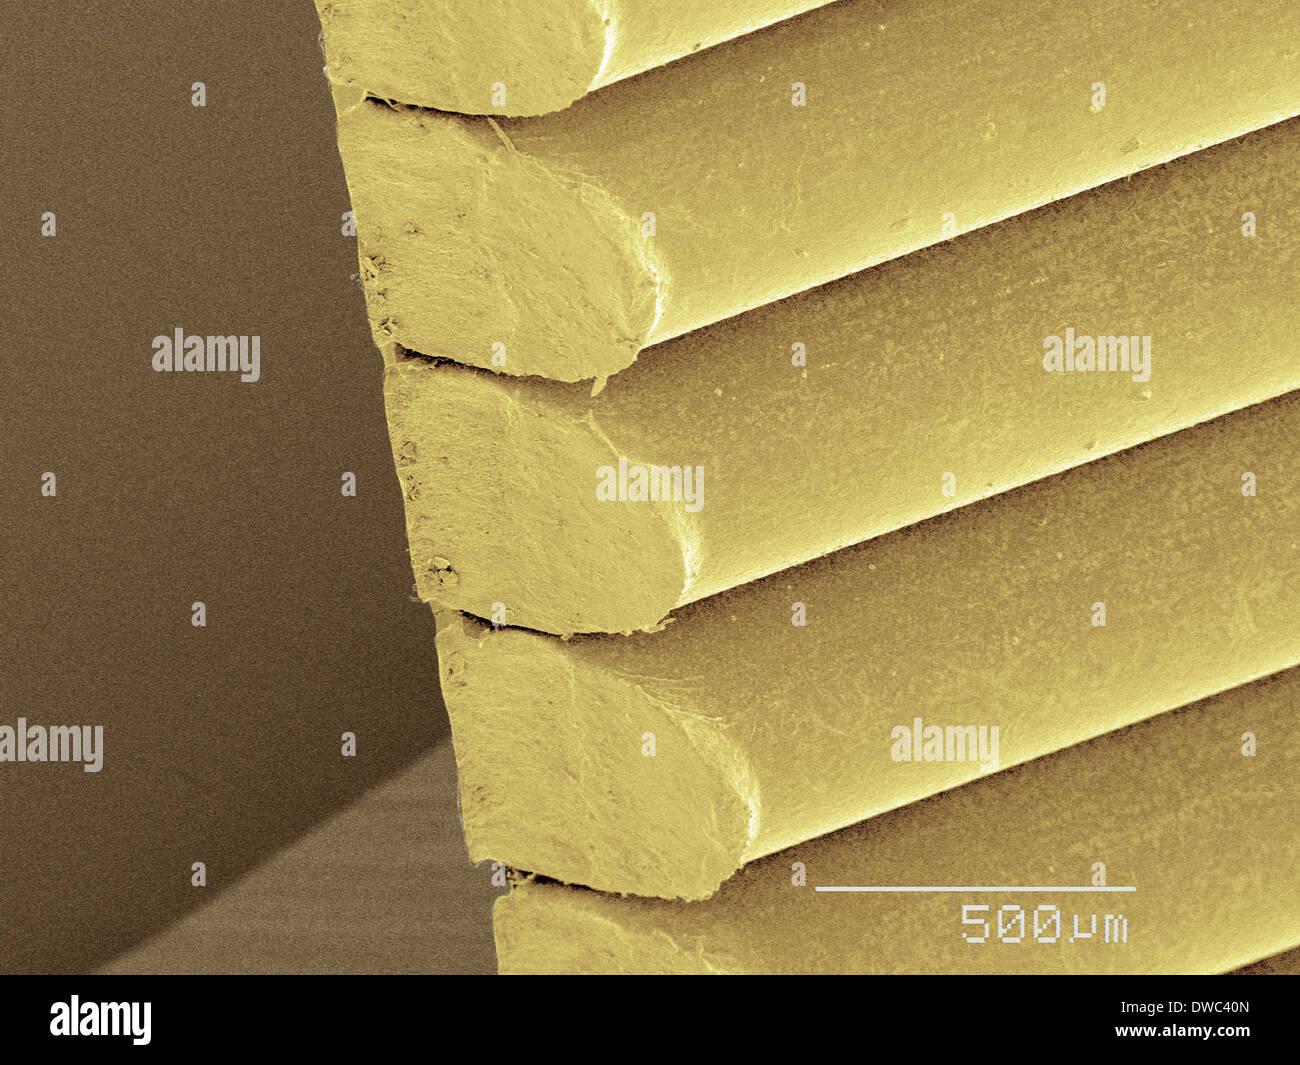 Coloured SEM of staples - Stock Image